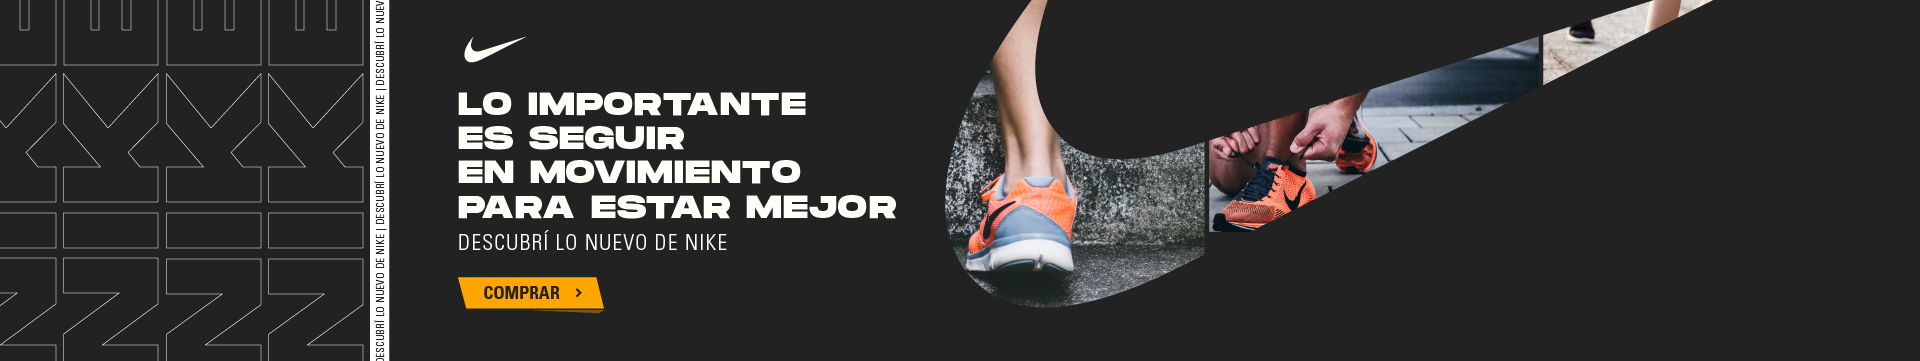 BANNER Nike generico